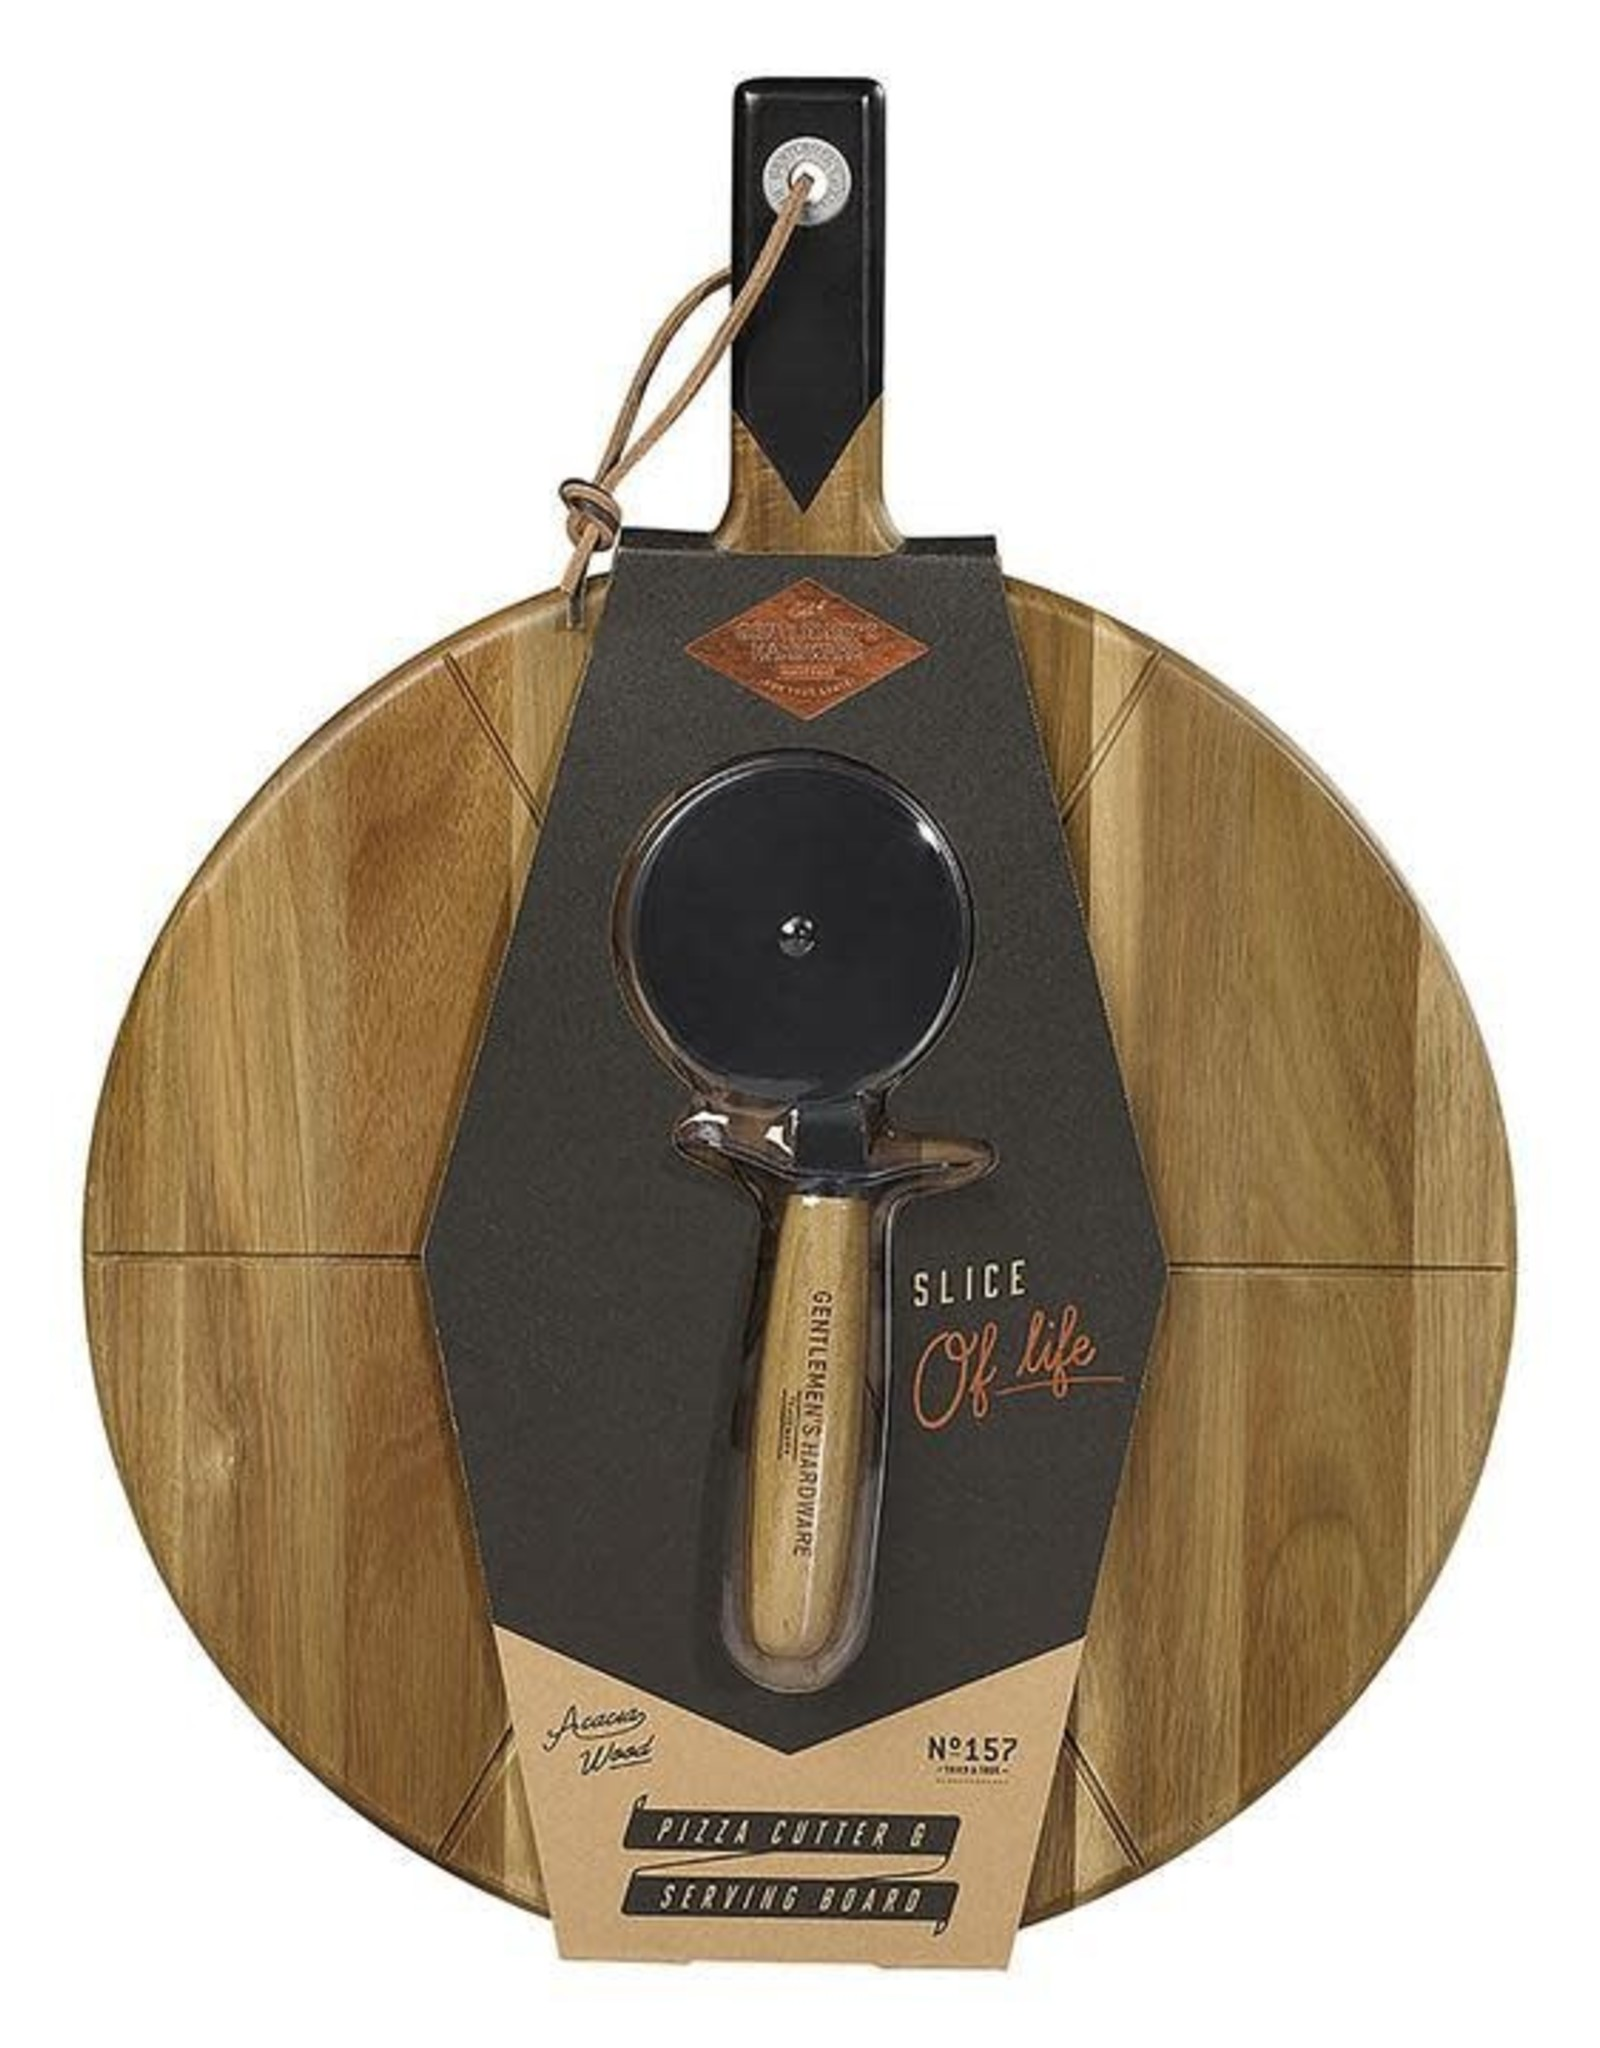 Gentlemen's Hardware Pizza Cutter & Serving Board